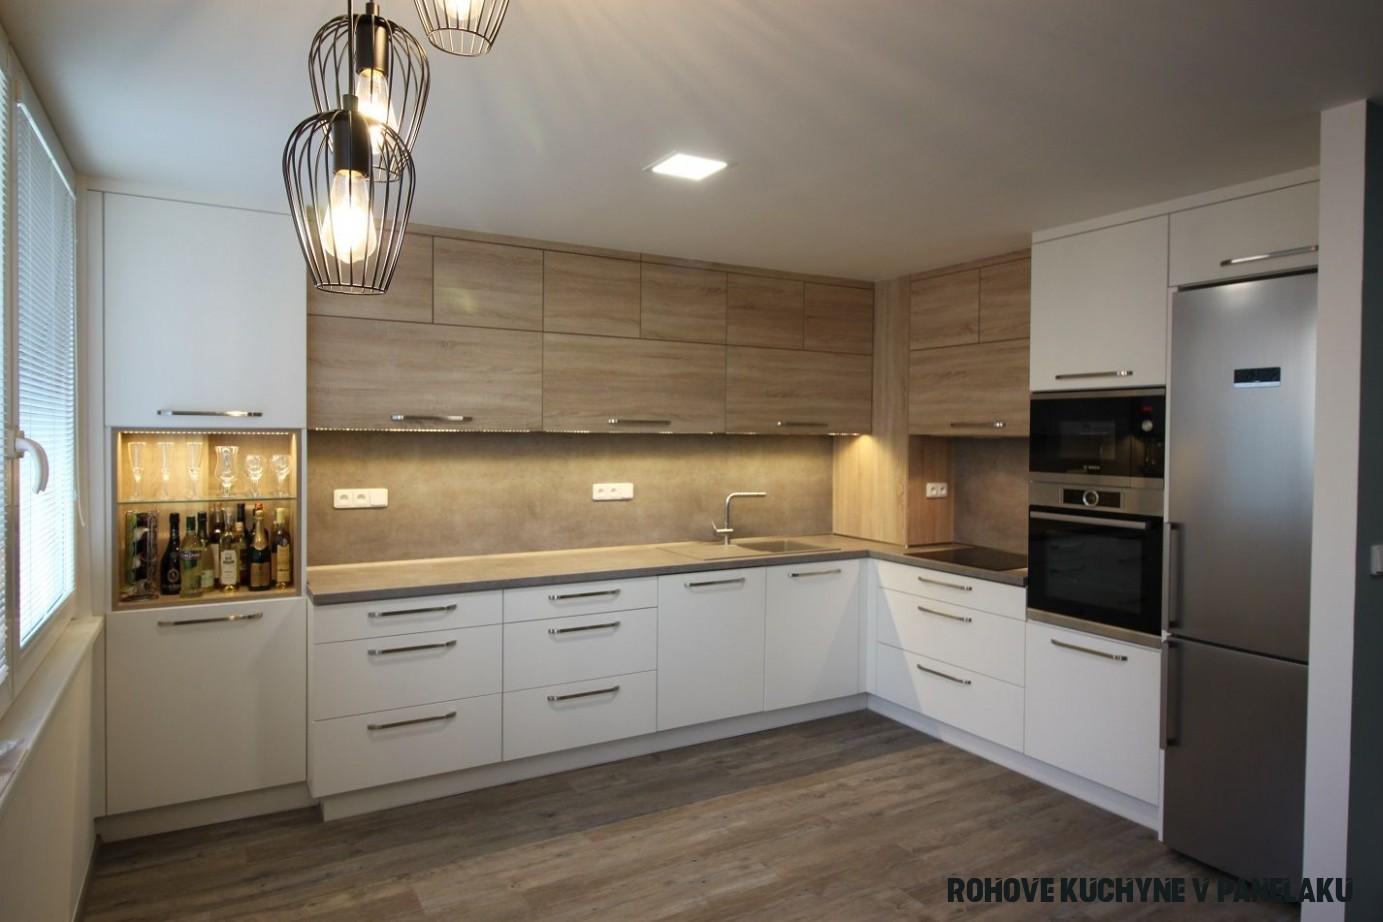 Paneláková kuchyňská linka ke stropu - Nábytek HVH  Modern